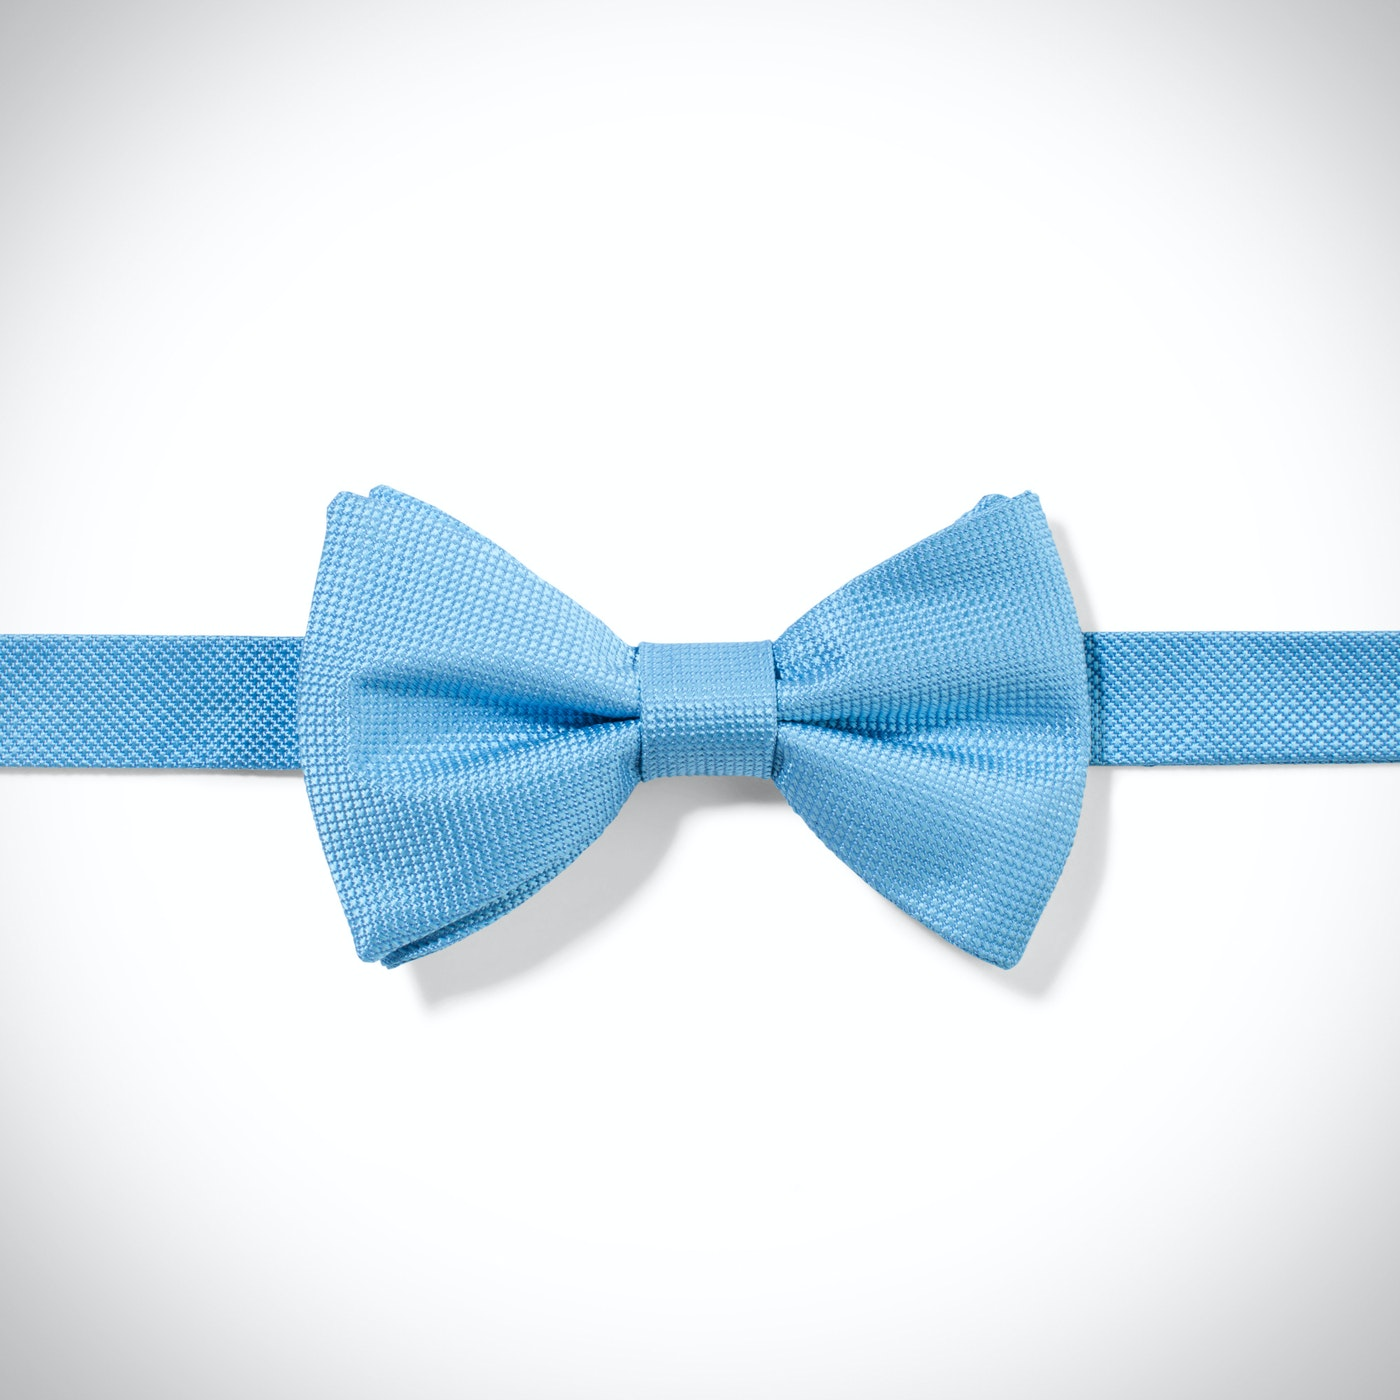 Glacier Blue Textured Micro Square Pre-Tied Bow Tie